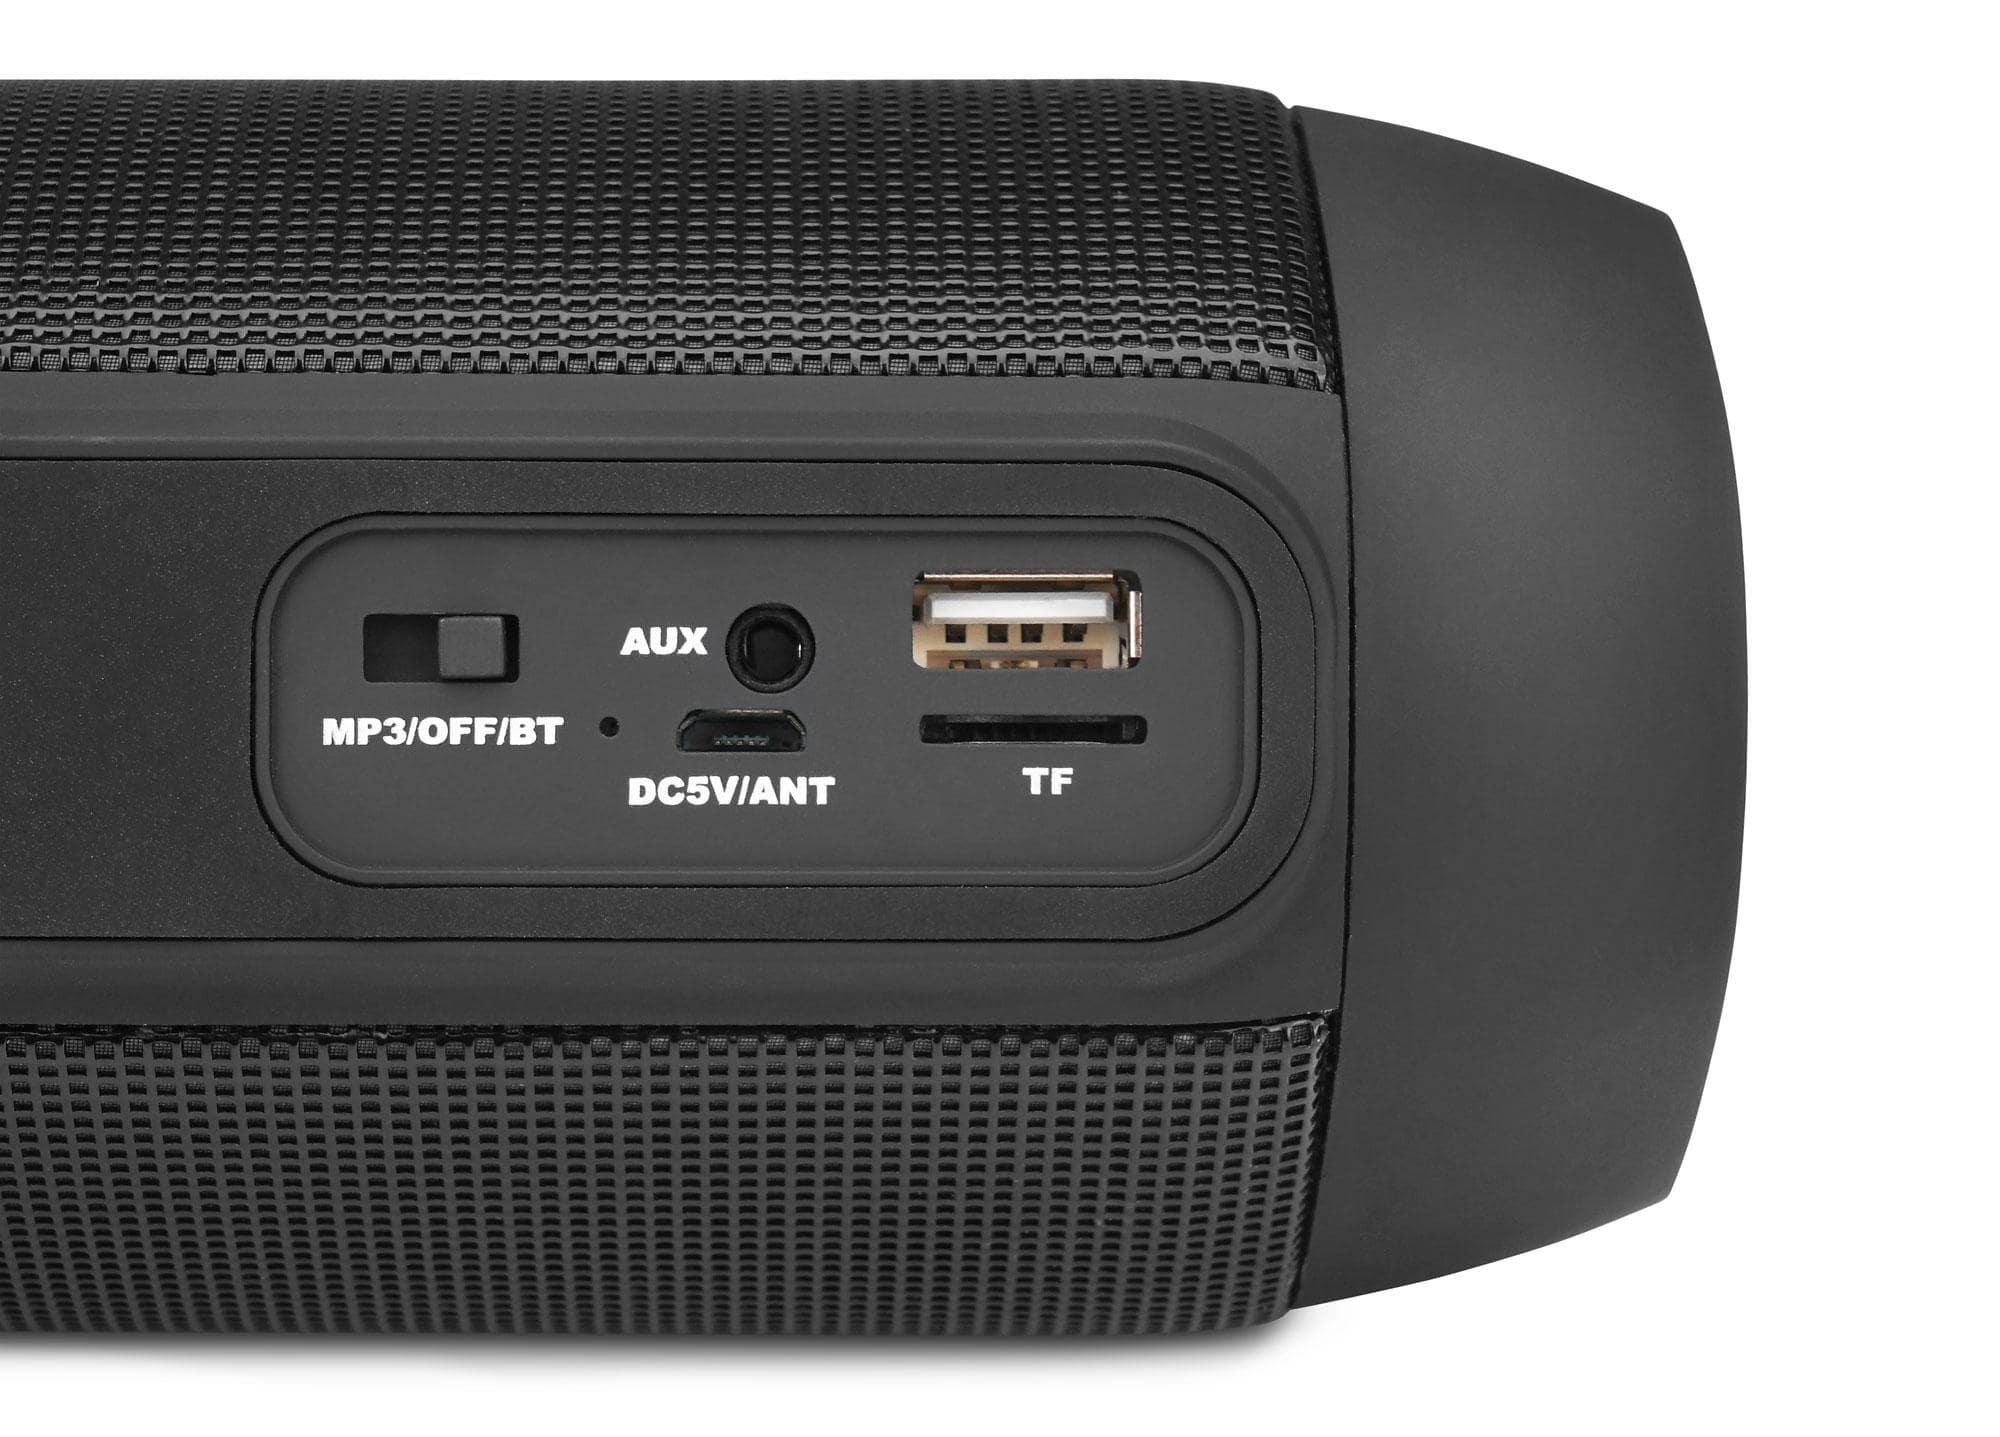 portabler bluetooth lautsprecher musik bass box stereo anlage usb sd mp3 player eur 24 90. Black Bedroom Furniture Sets. Home Design Ideas